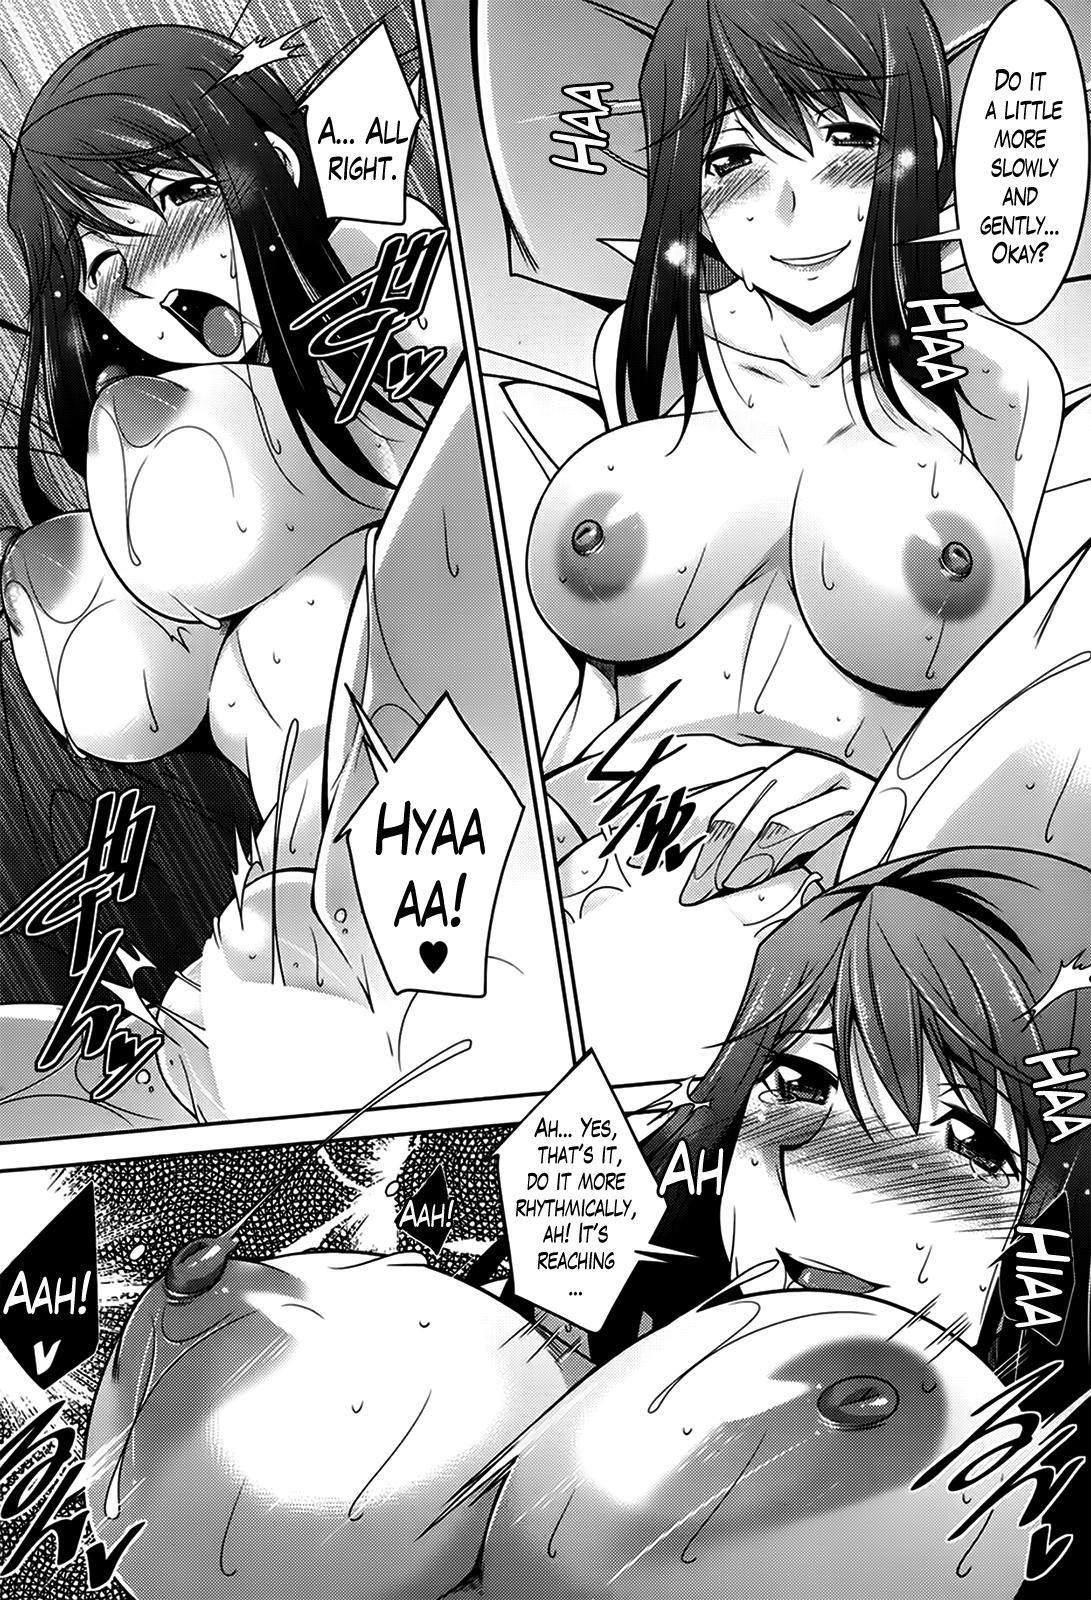 [Zen9] Taikutsu na Gogo no Sugoshikata Ch. 1-5   A Way to Spend a Boring Afternoon Ch. 1-5 (Action Pizazz DX 2013-12) [English](hentai2read.com)[Lazarus H] 71